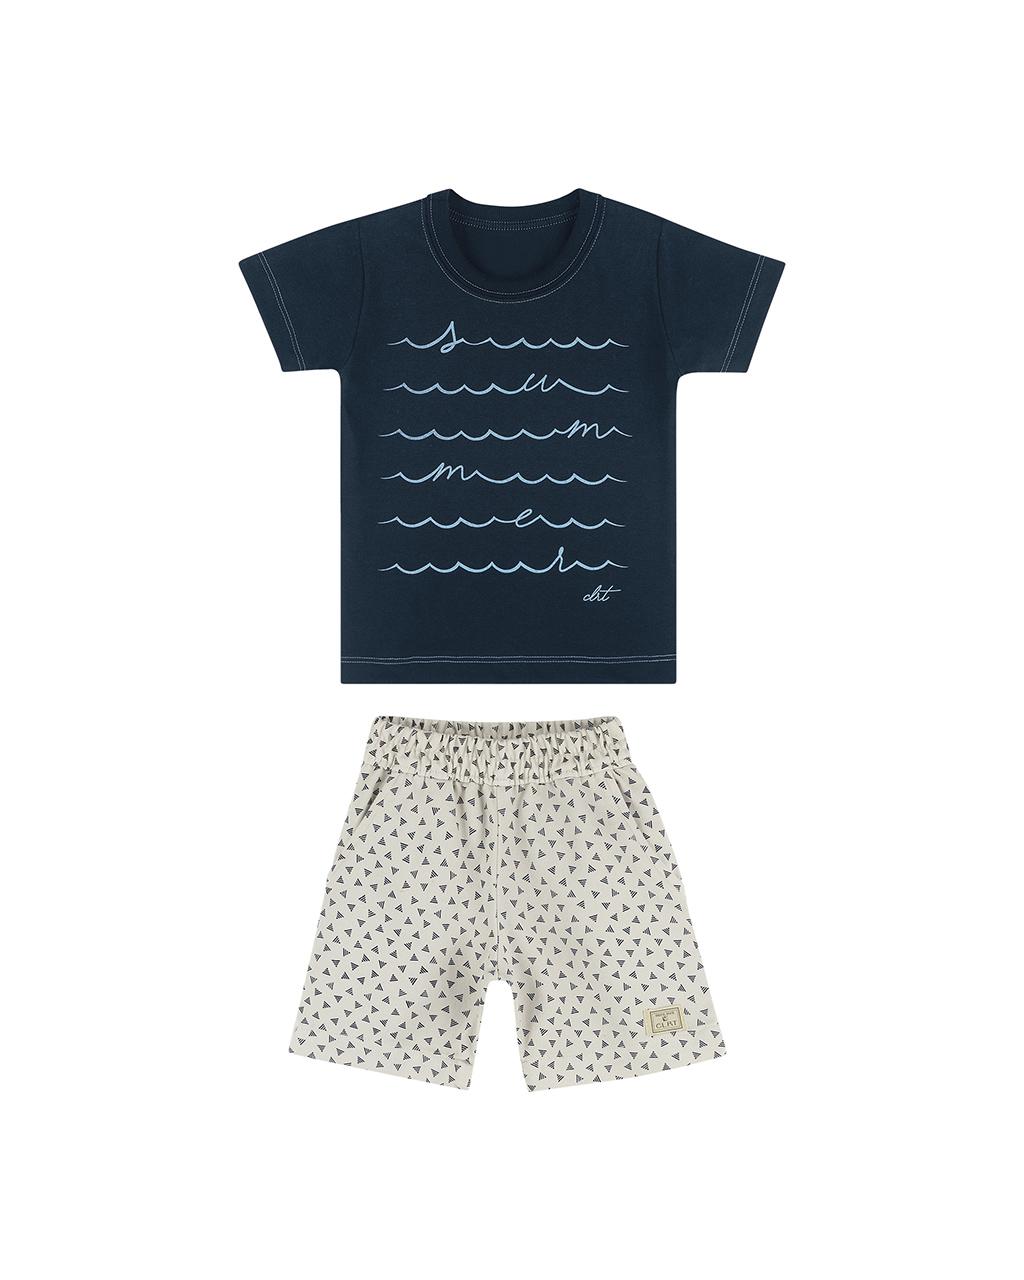 Conjunto Masculino Infantil Camiseta E Bermuda com Elástico Coloritá